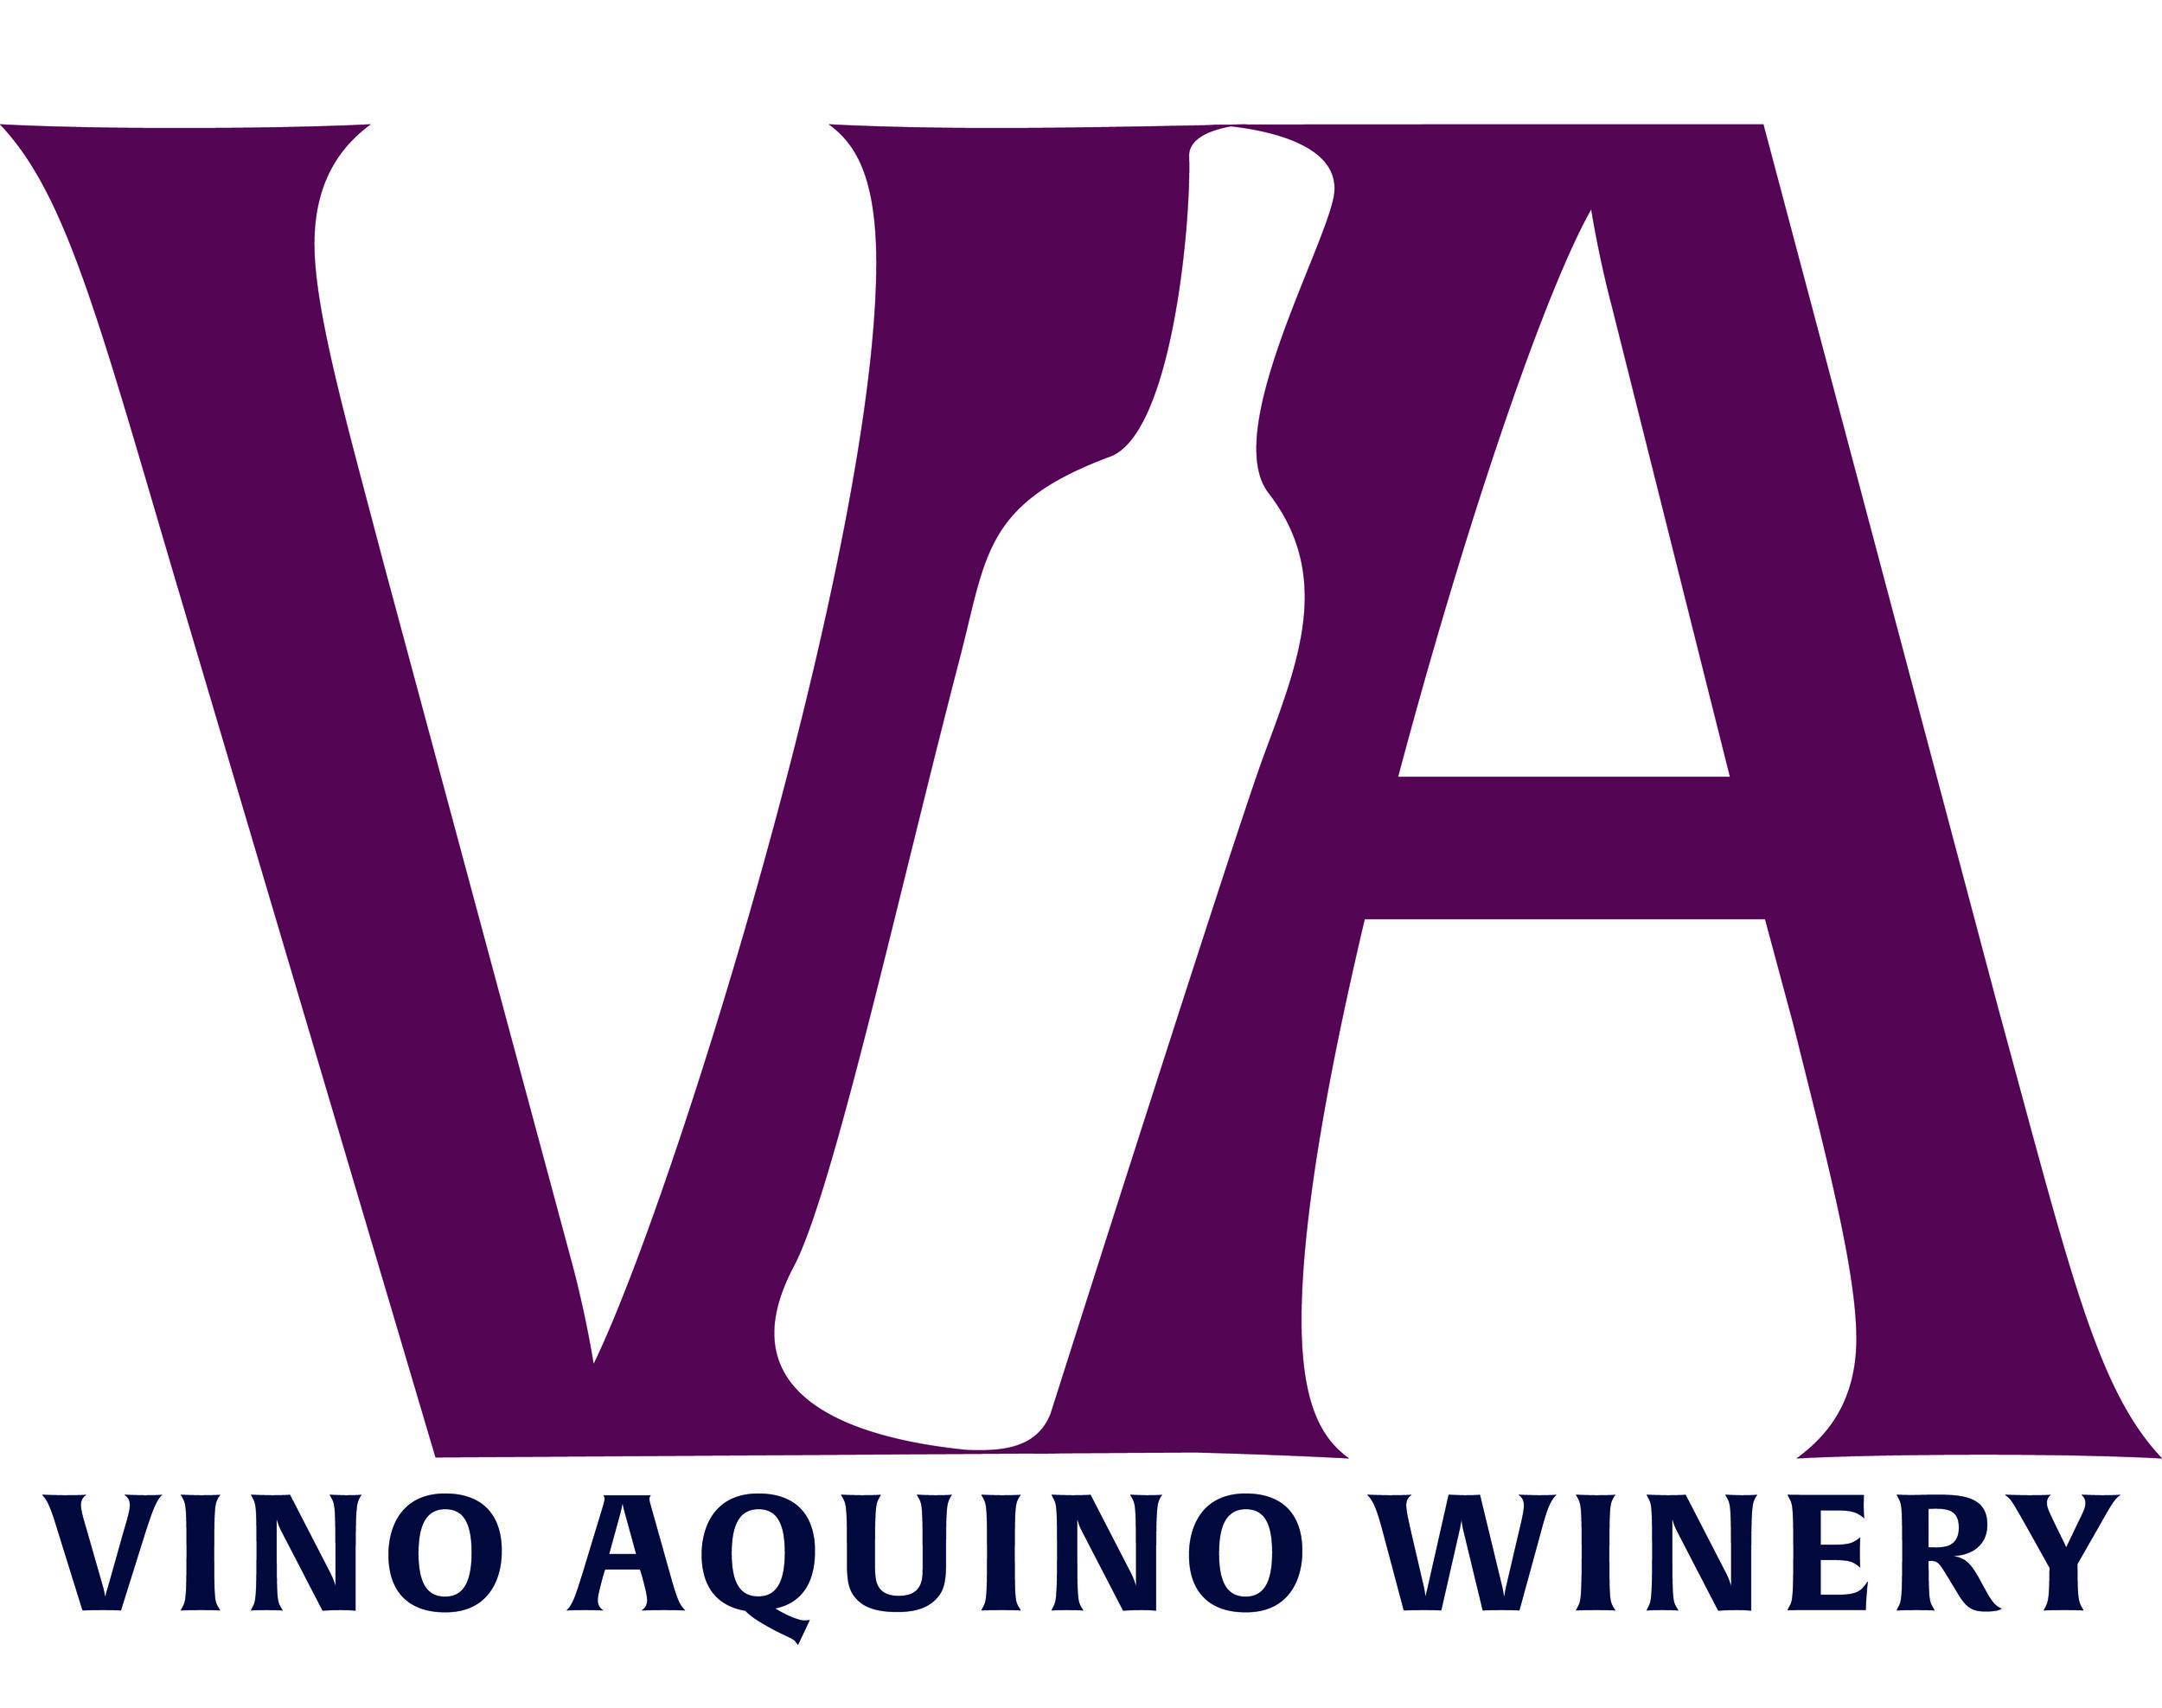 Vino Aquino Logo.JPG